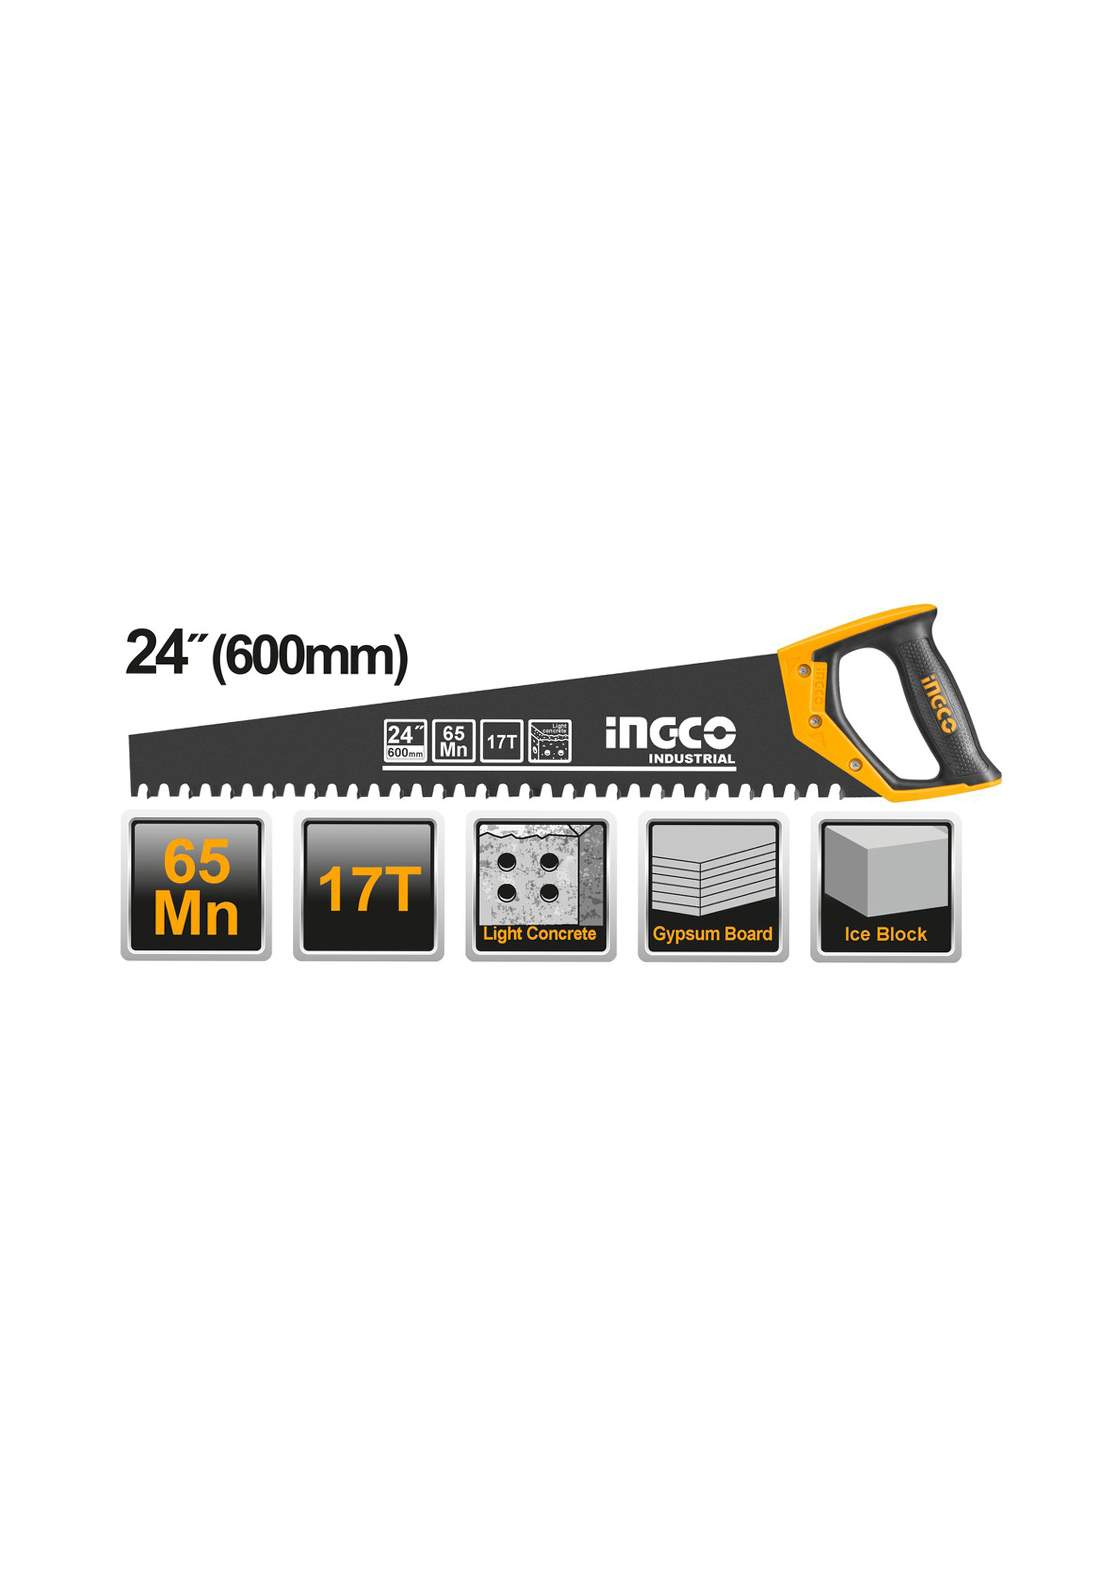 Ingco HCBS016001  Light Concrete Saw 600mm منشار جوكر